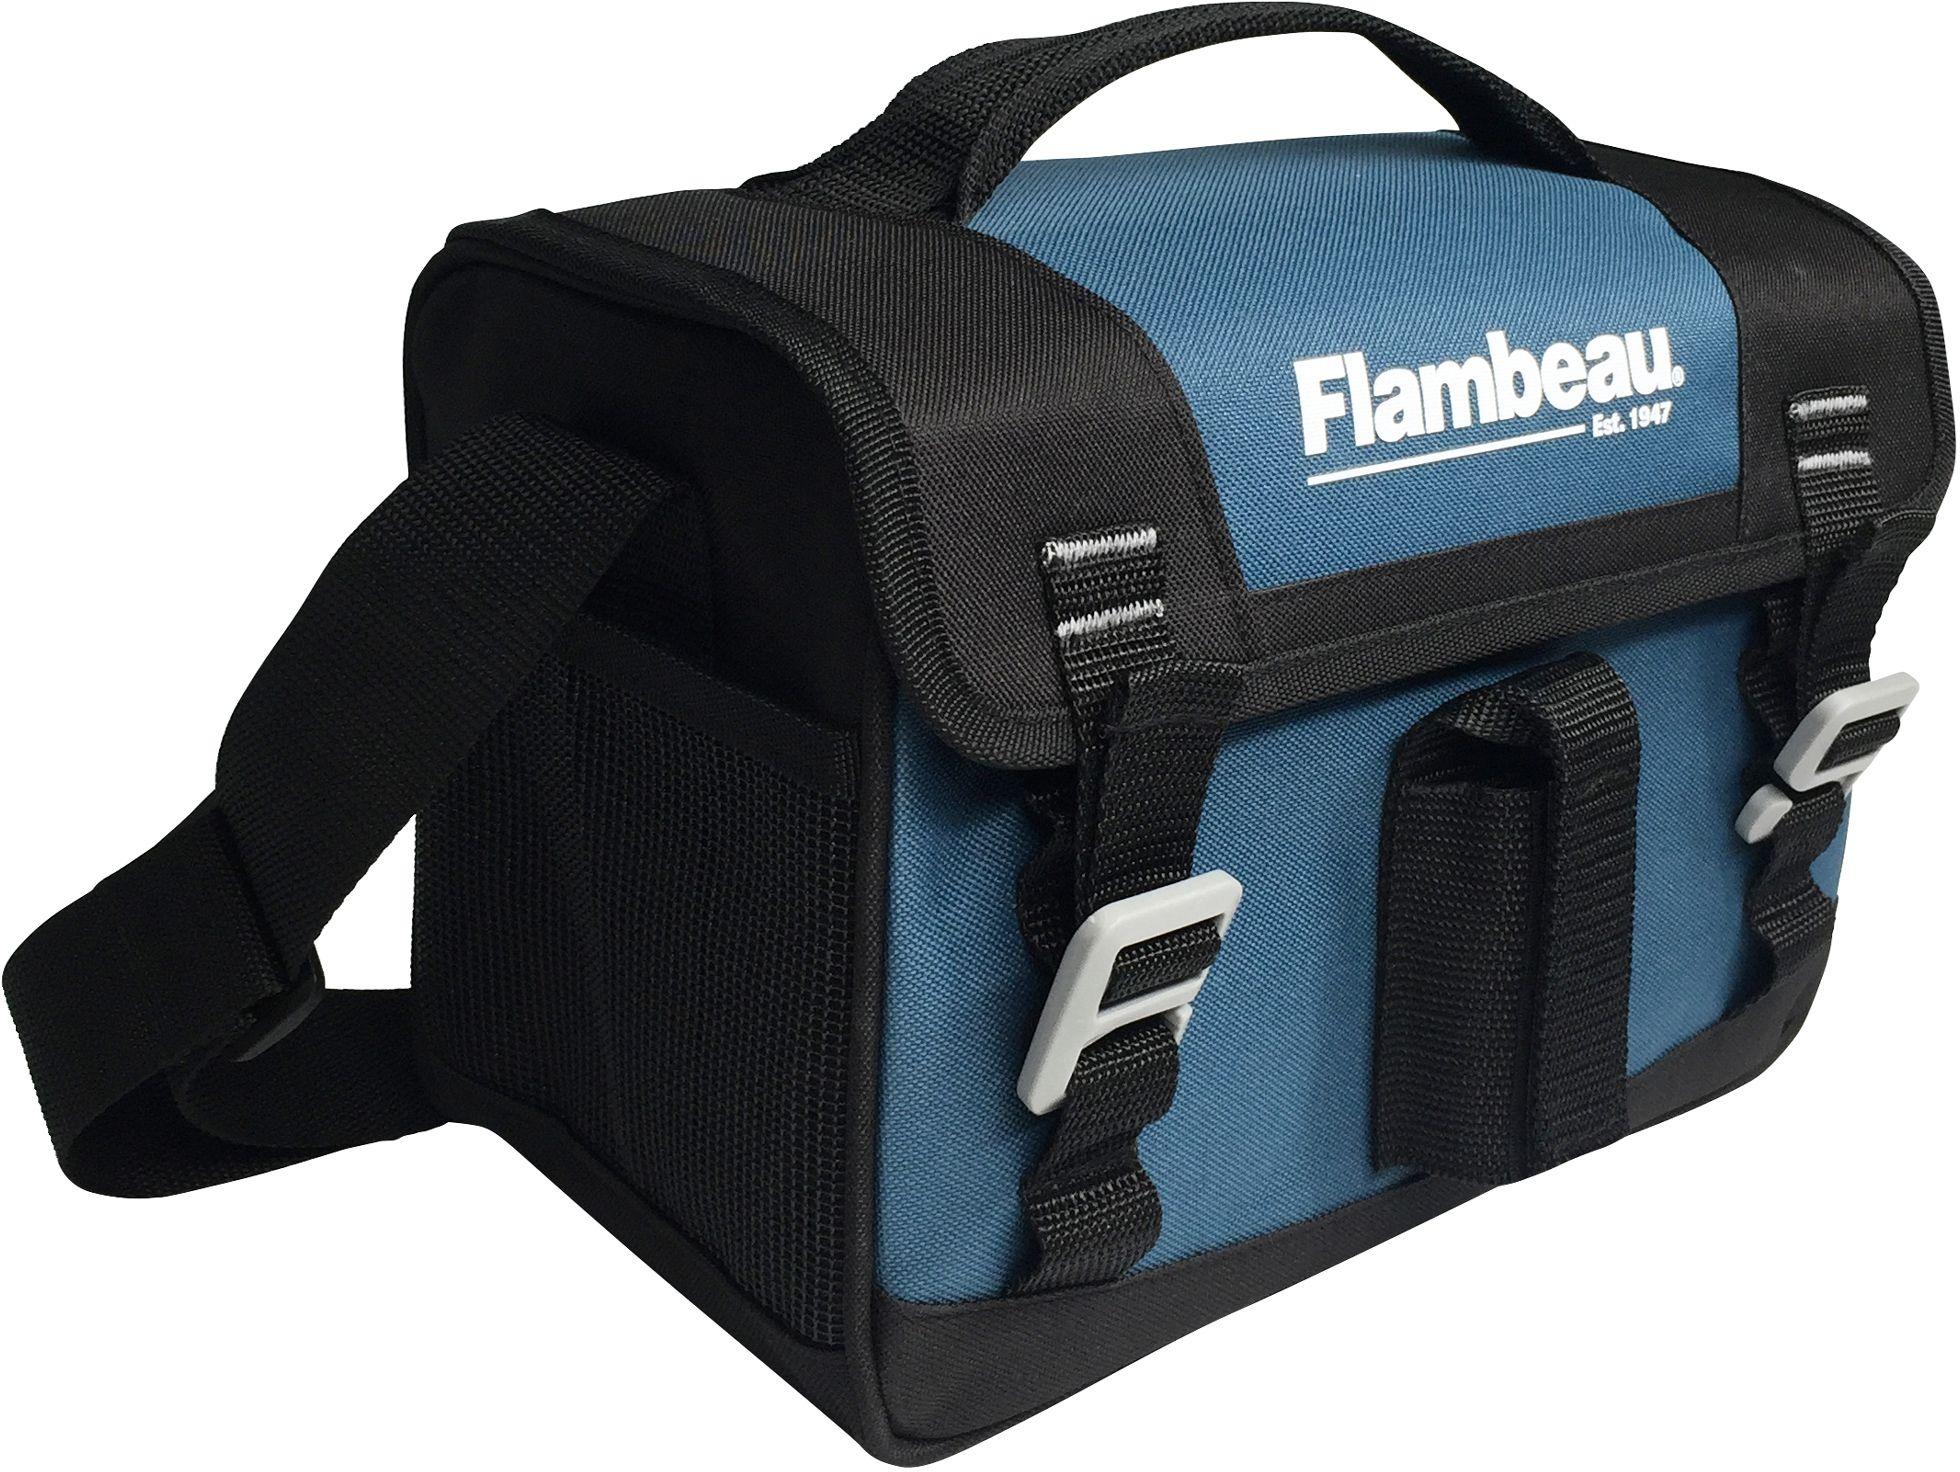 Flambeau Adventurer Medium Tackle Bag, Size: One size